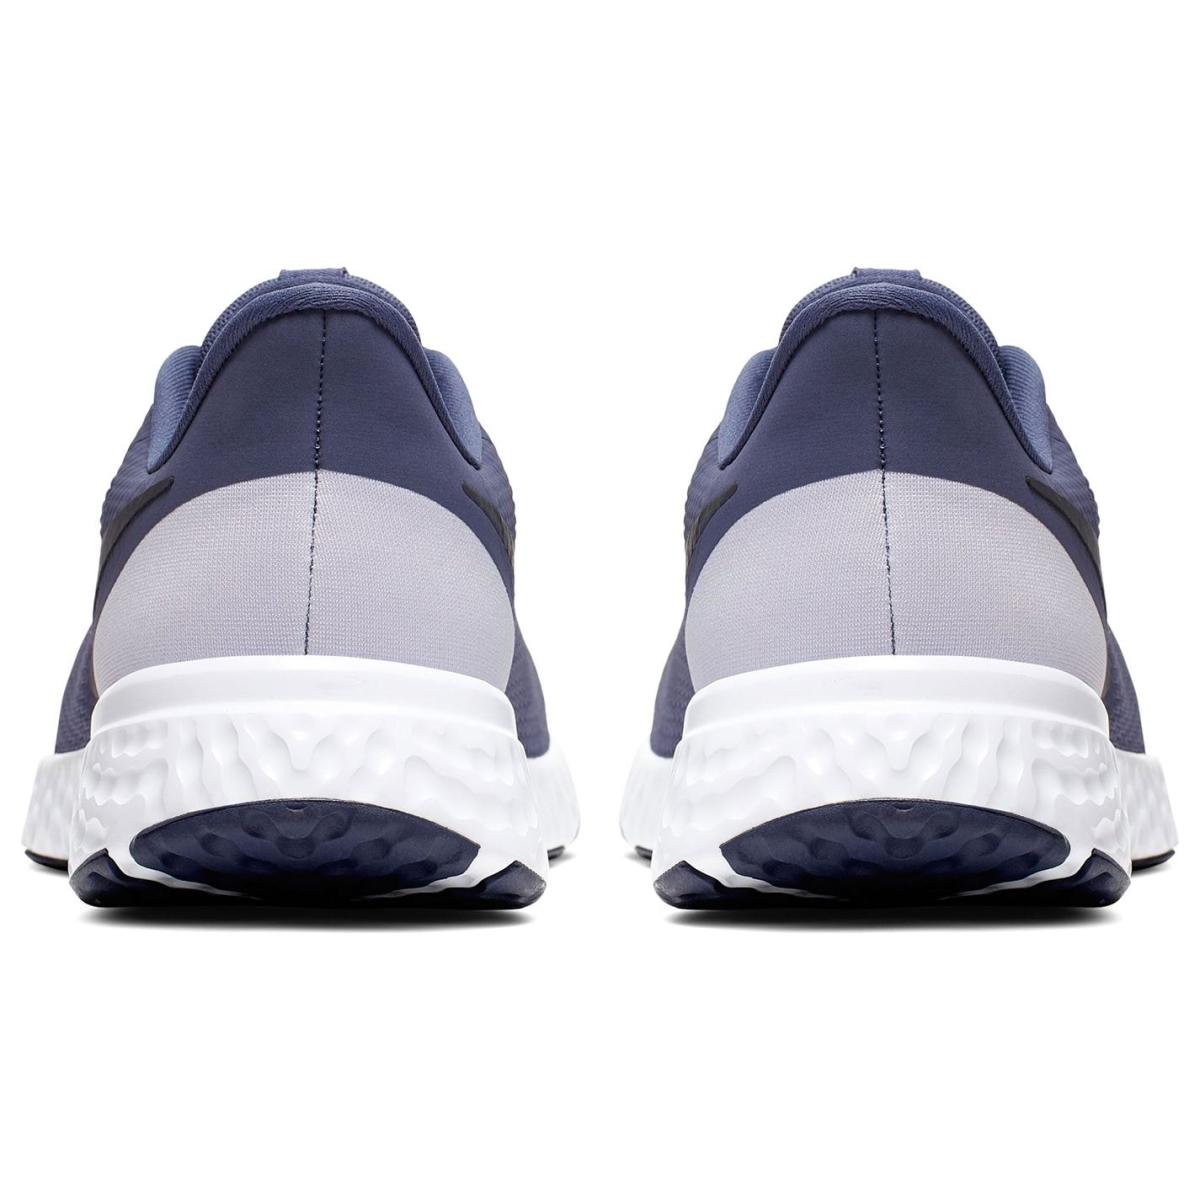 Nike-Revolution-Turnschuhe-Damen-Sneaker-Sportschuhe-Laufschuhe-1160 Indexbild 45